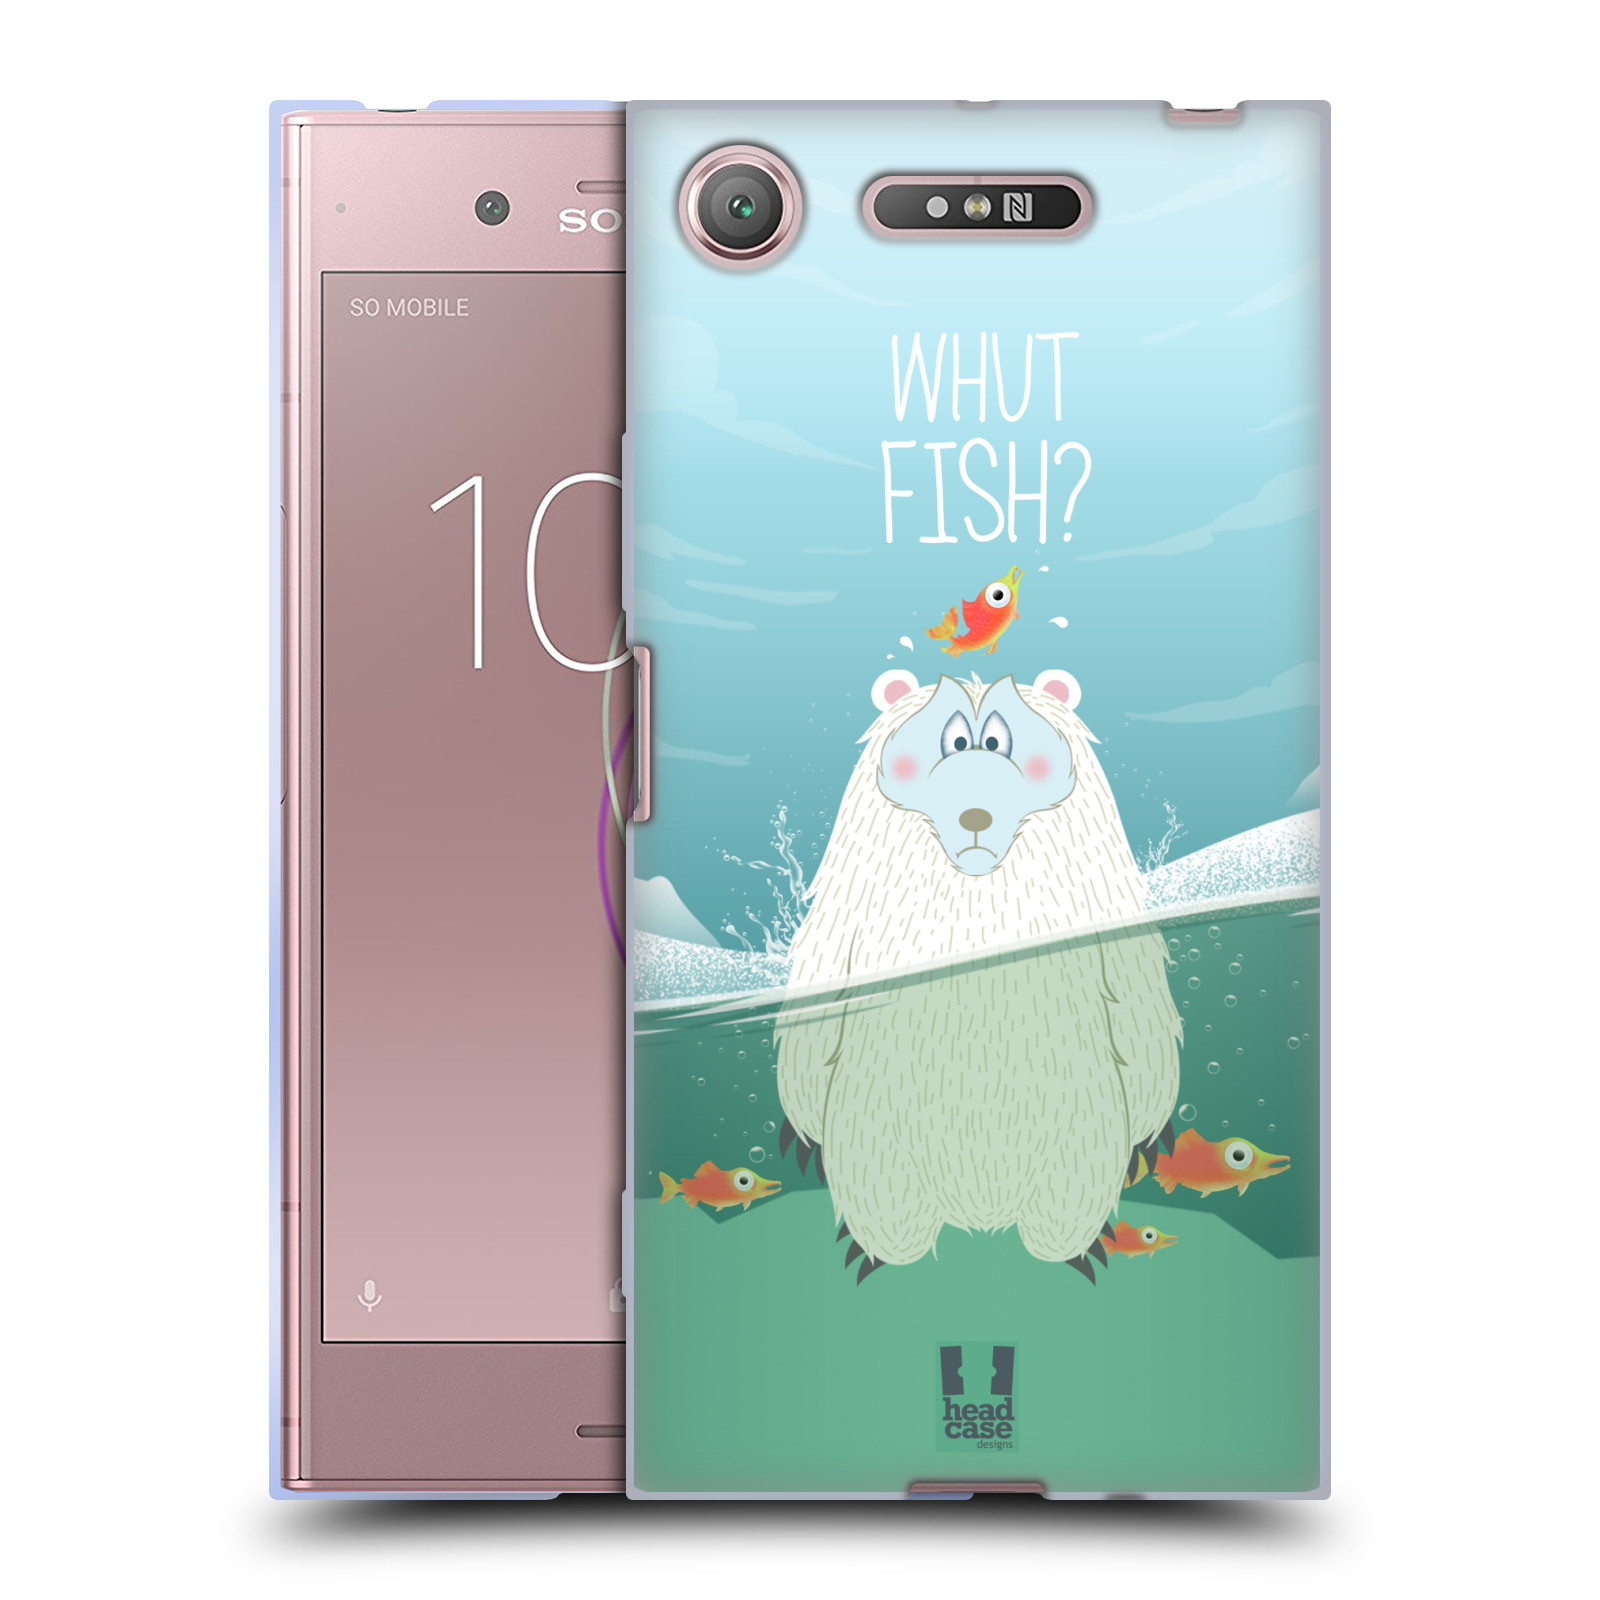 Silikonové pouzdro na mobil Sony Xperia XZ1 - Head Case - Medvěd Whut Fish?